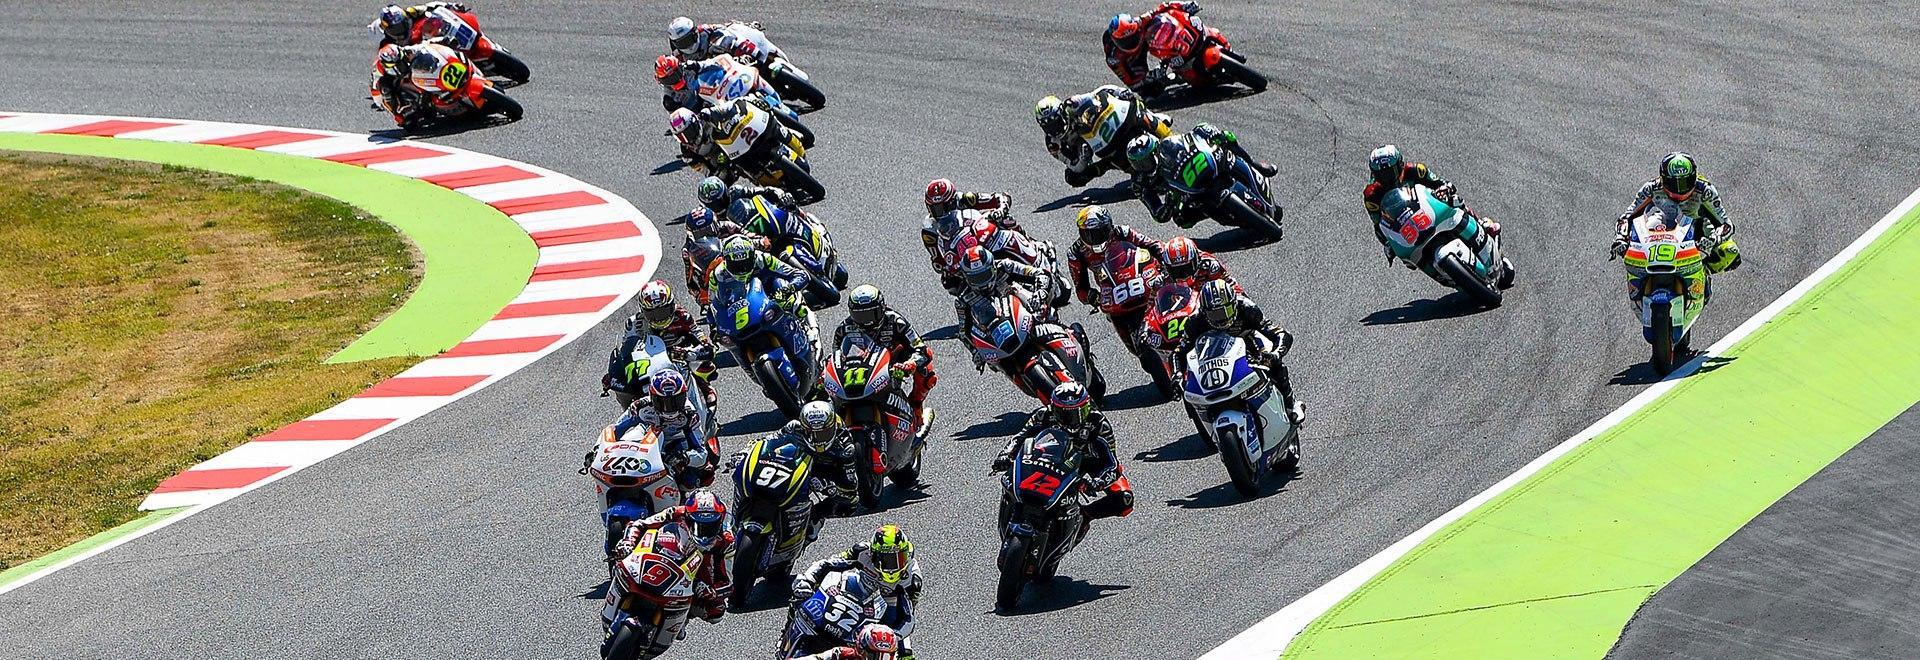 GP Valencia: Moto3. Race 1